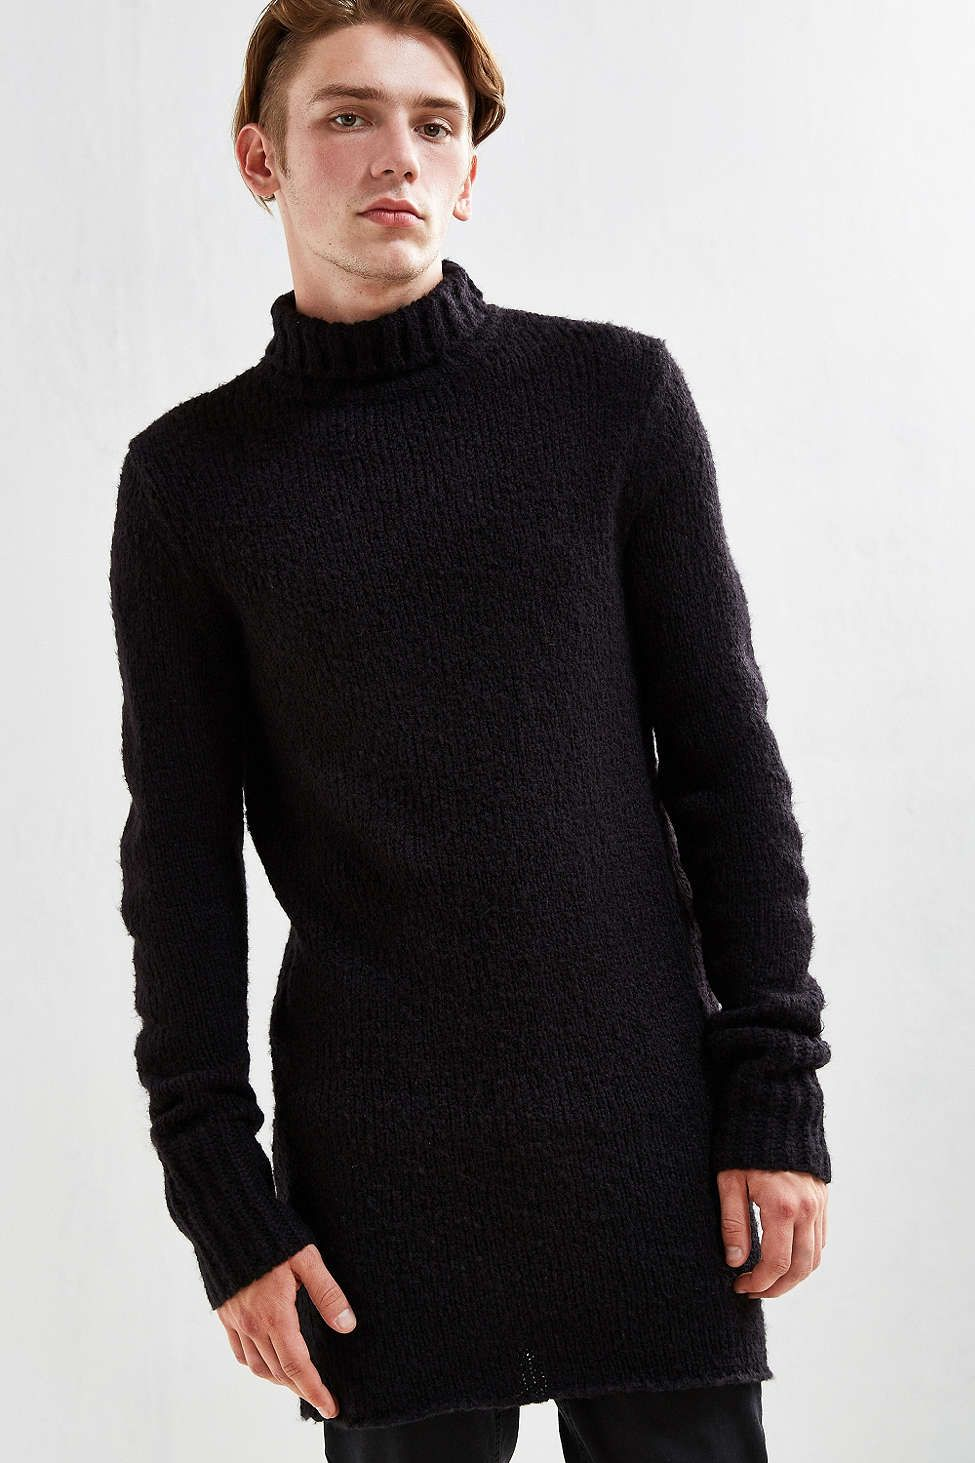 Cheap Monday Longline Turtleneck Sweater | Mondays, Urban and Sweaters